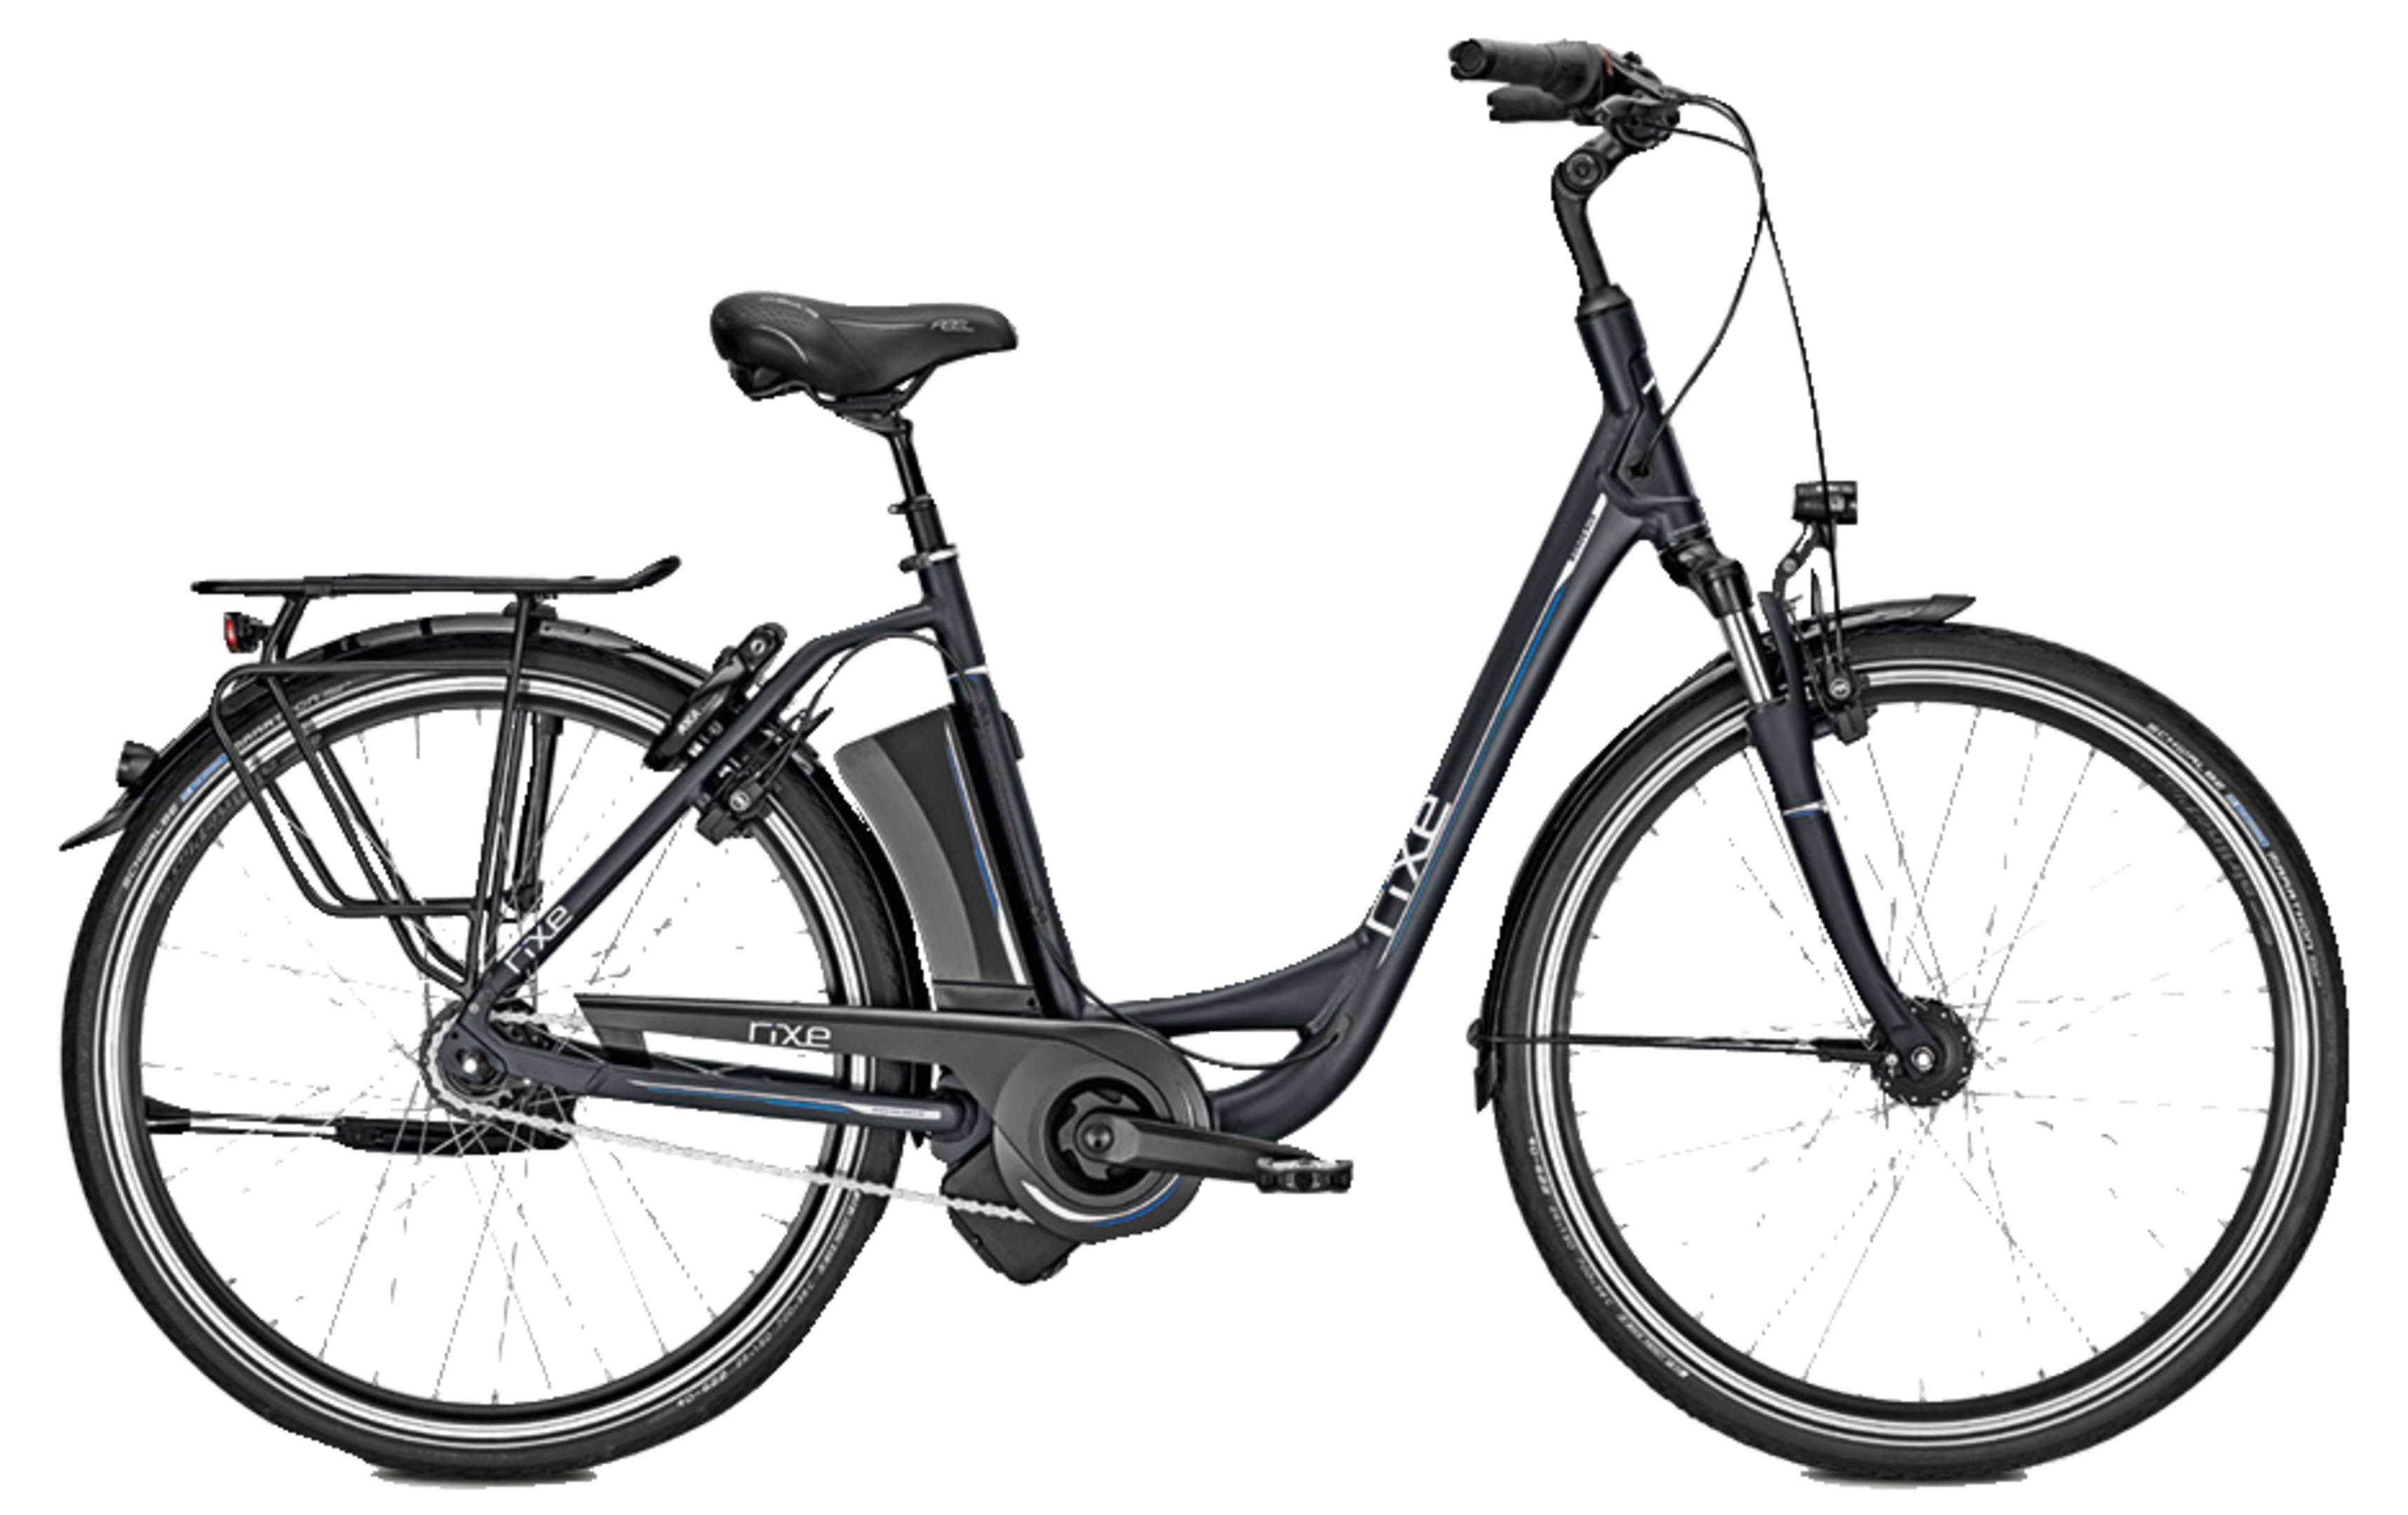 rixe e bike bordeaux i8 xxl hs 8g 17ah 36v eurorad. Black Bedroom Furniture Sets. Home Design Ideas